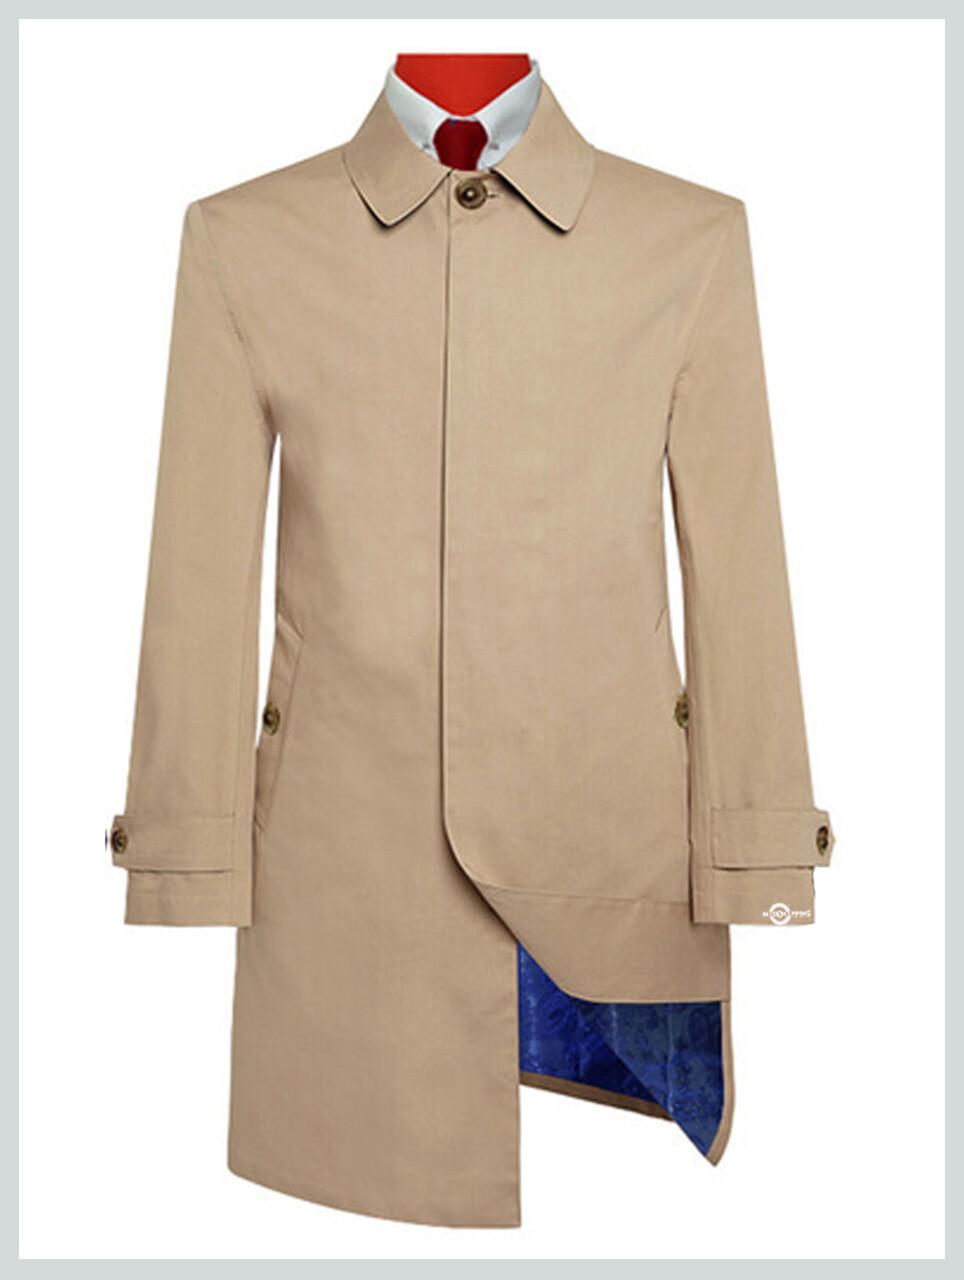 Mac Coat Mens  Original Vintage Style 100% Cotton Khaki Mac Coat